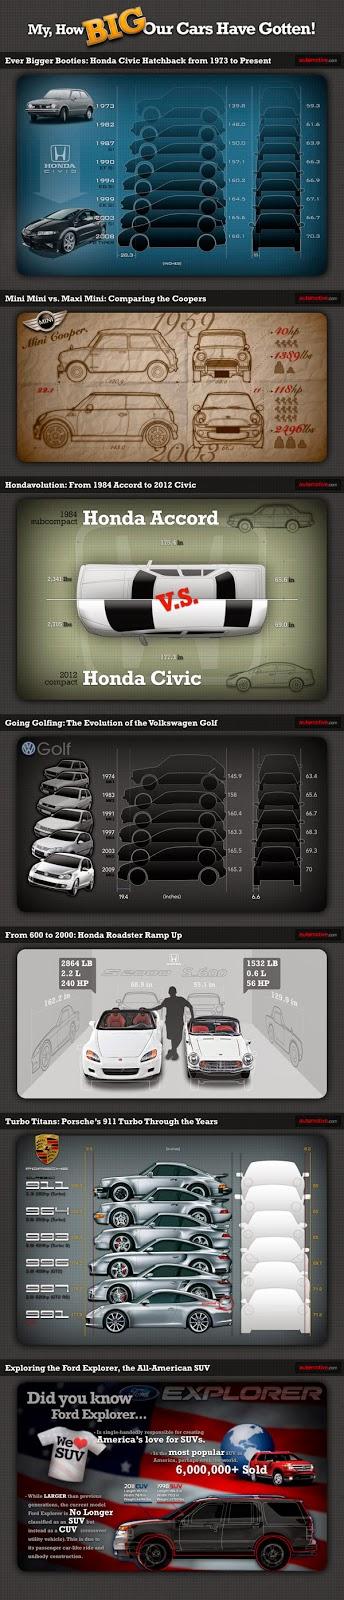 http://infographicsmania.com/how-big-cars-have-gotten/